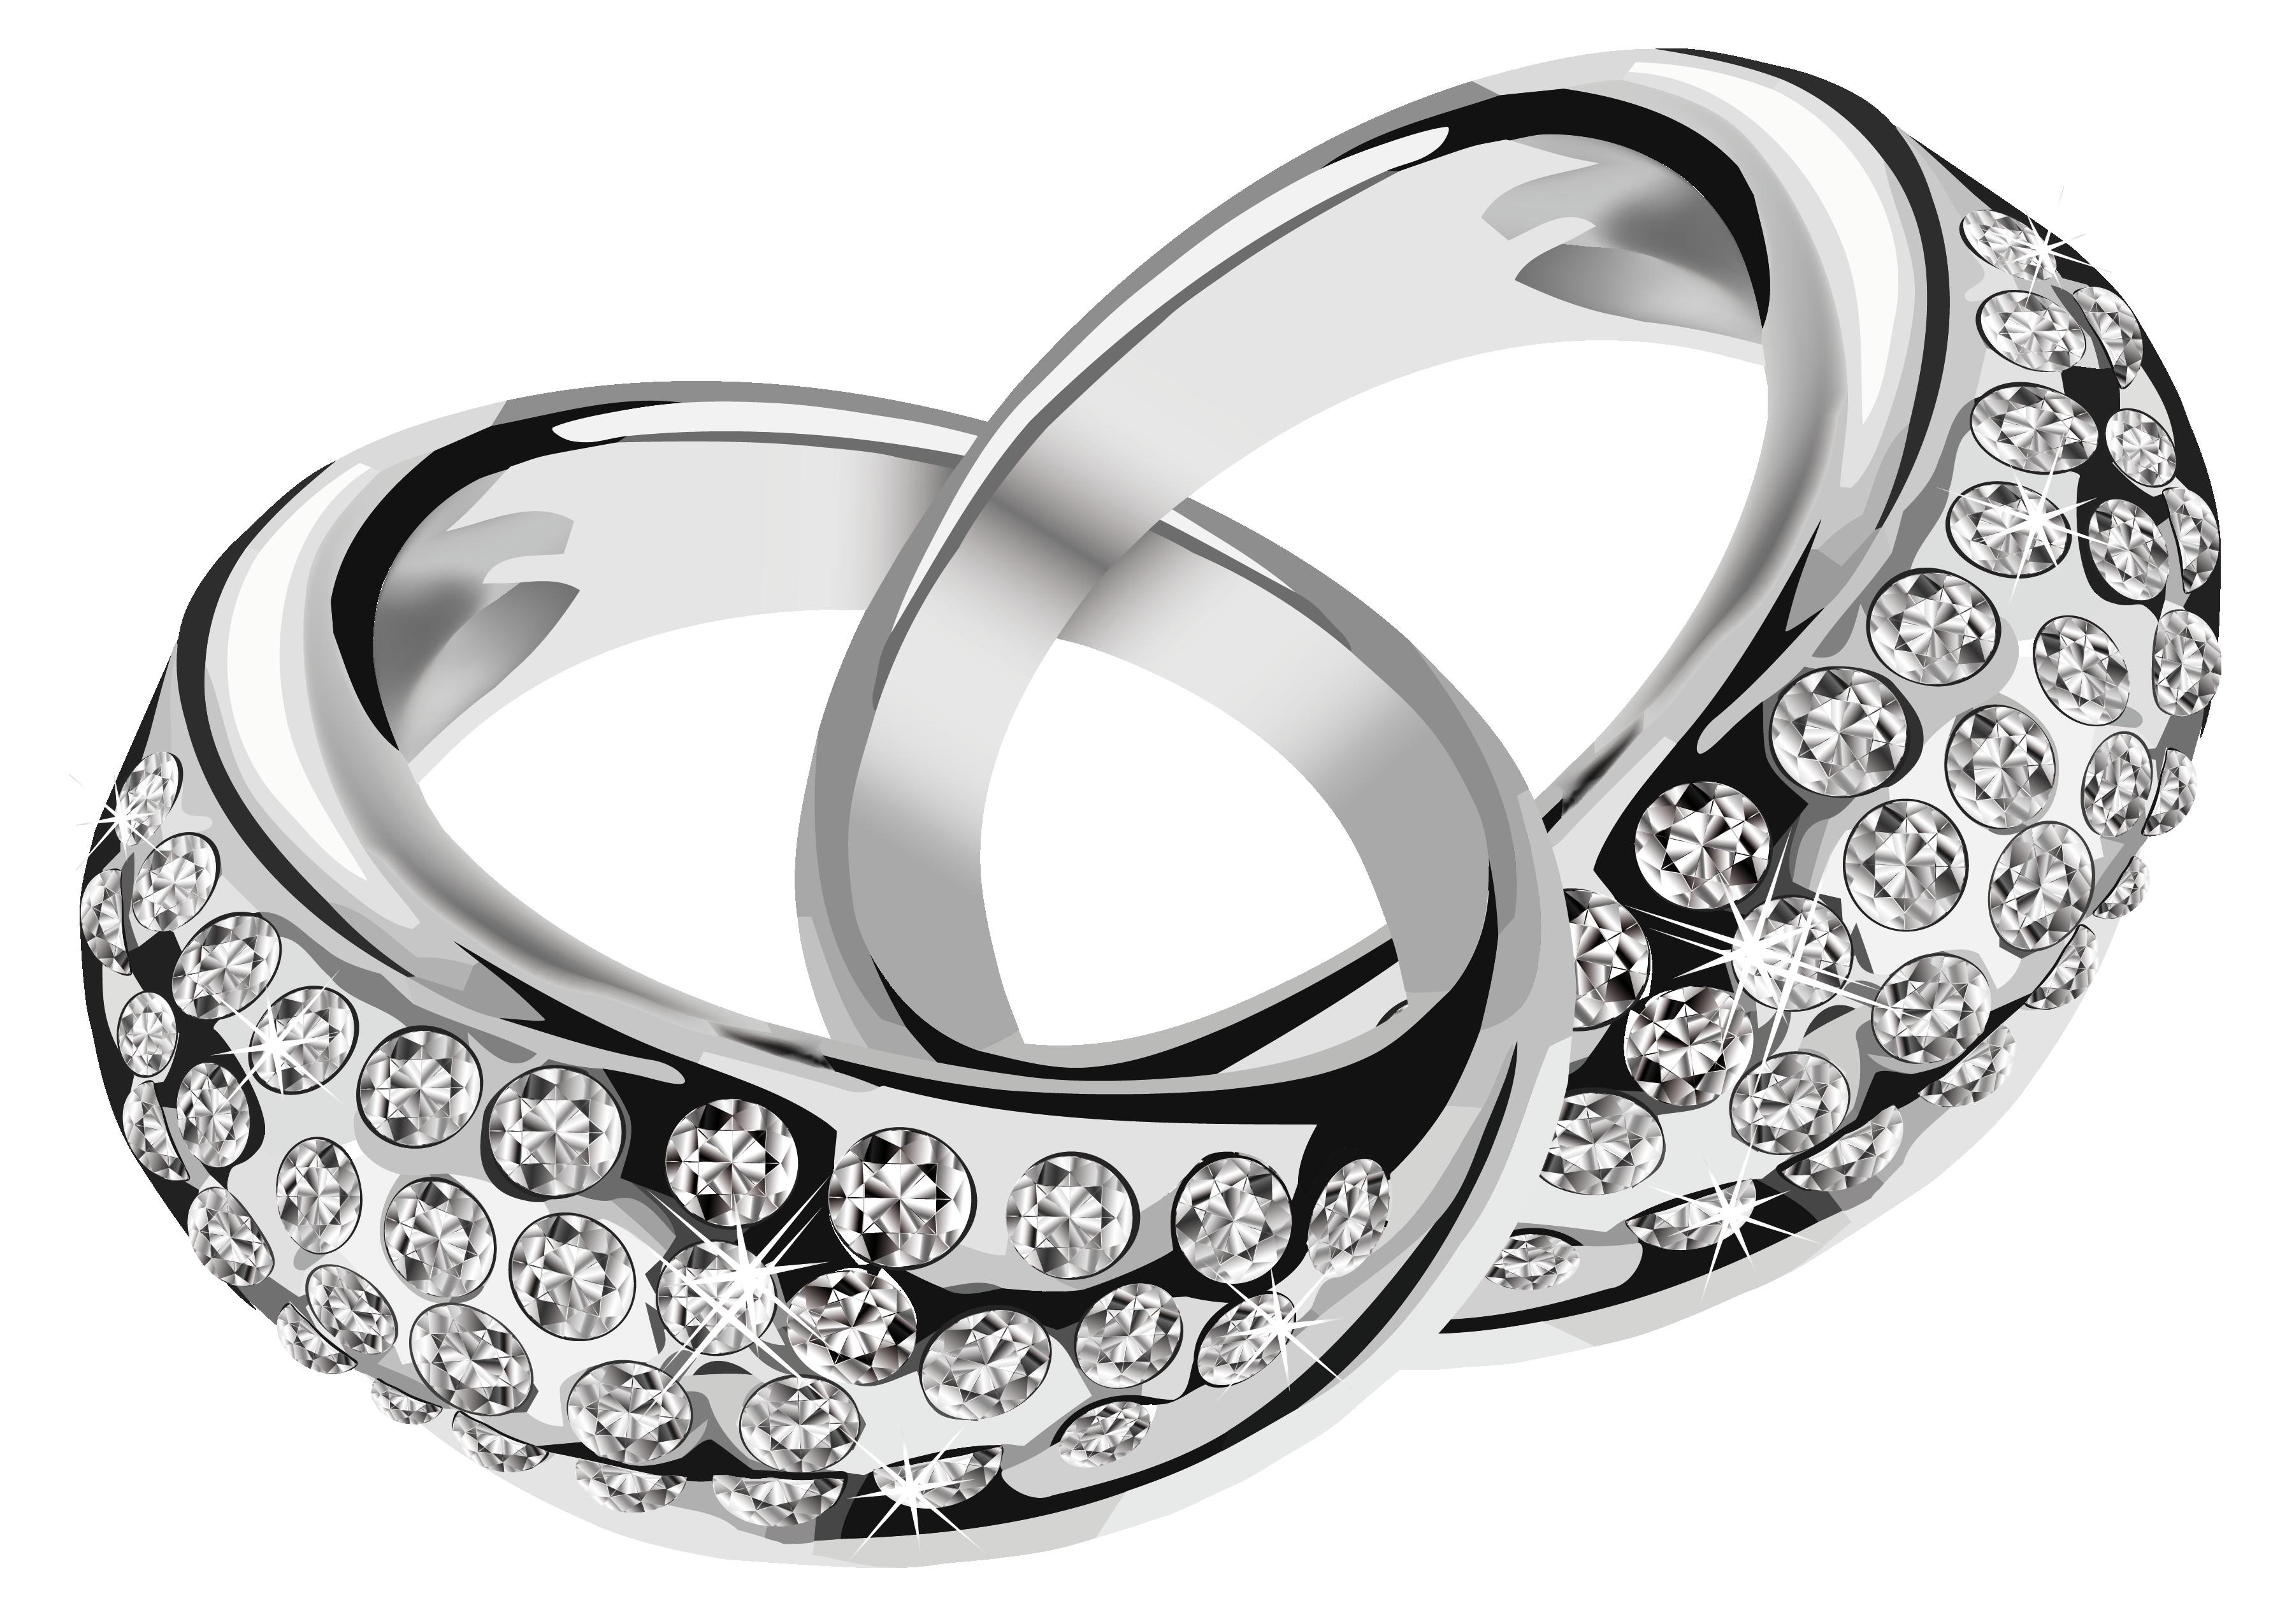 Wedding : Wedding Rings Clipart Interlocking Making Two Clip Art ... vector royalty free